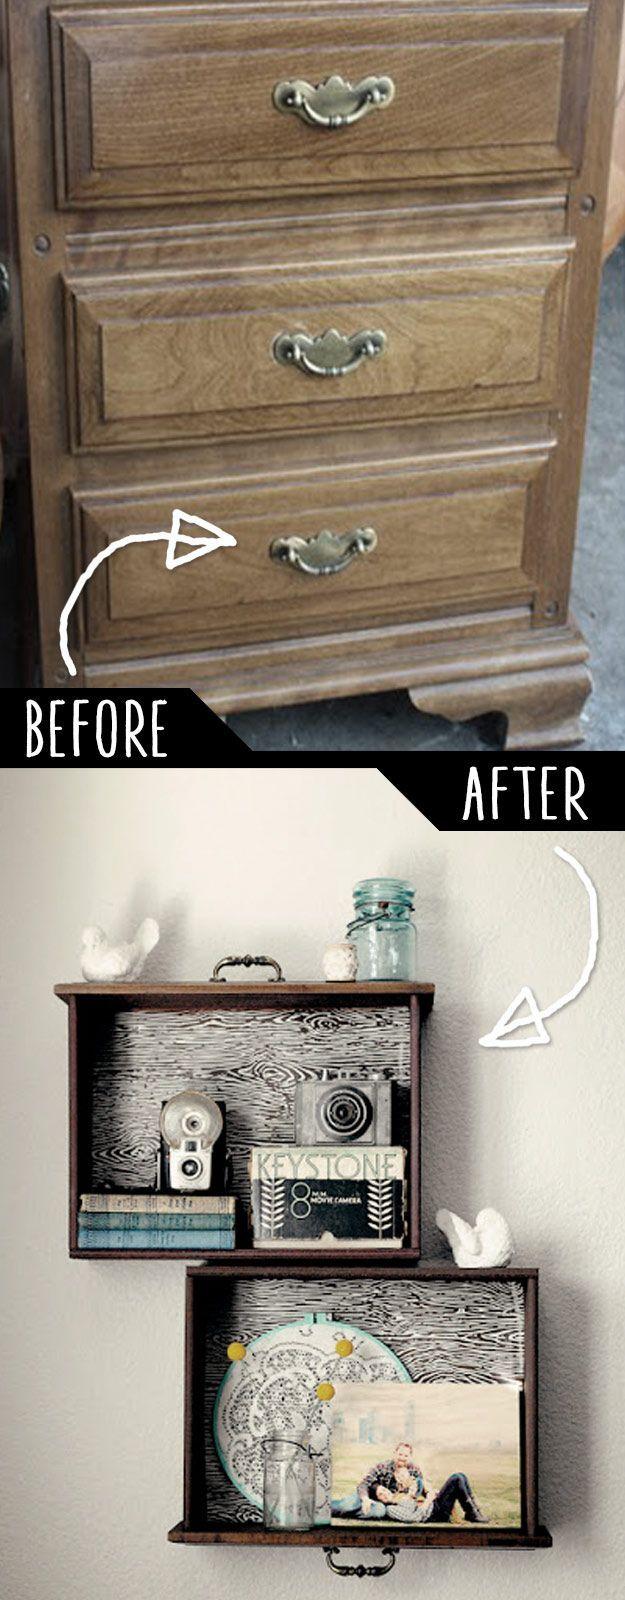 creative bedroom furniture. DIY Furniture Hacks | Drawer Shelves Cool Ideas For Creative Do It Yourself Cheap Home Decor Bedroom, Bathroom, Living Room, Bedroom N